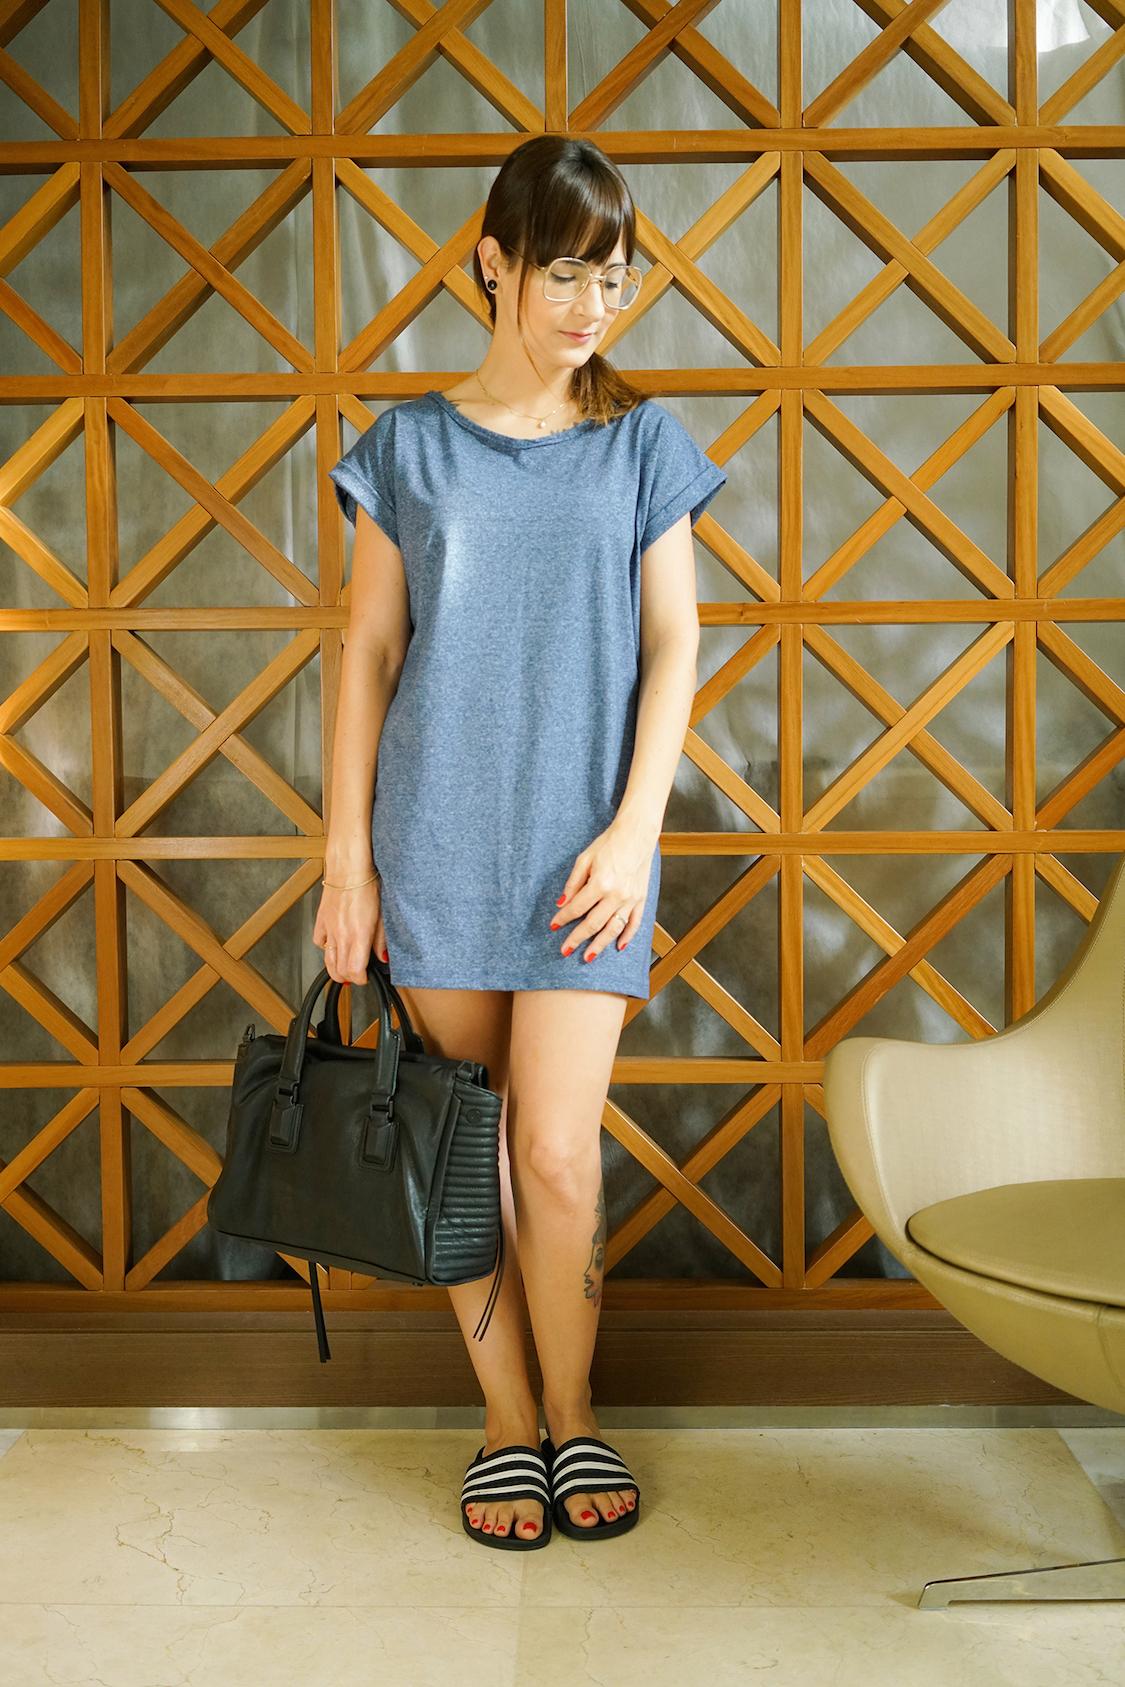 vestido-camiseta-look-aeroporto-brasilia-danielle-noce-4